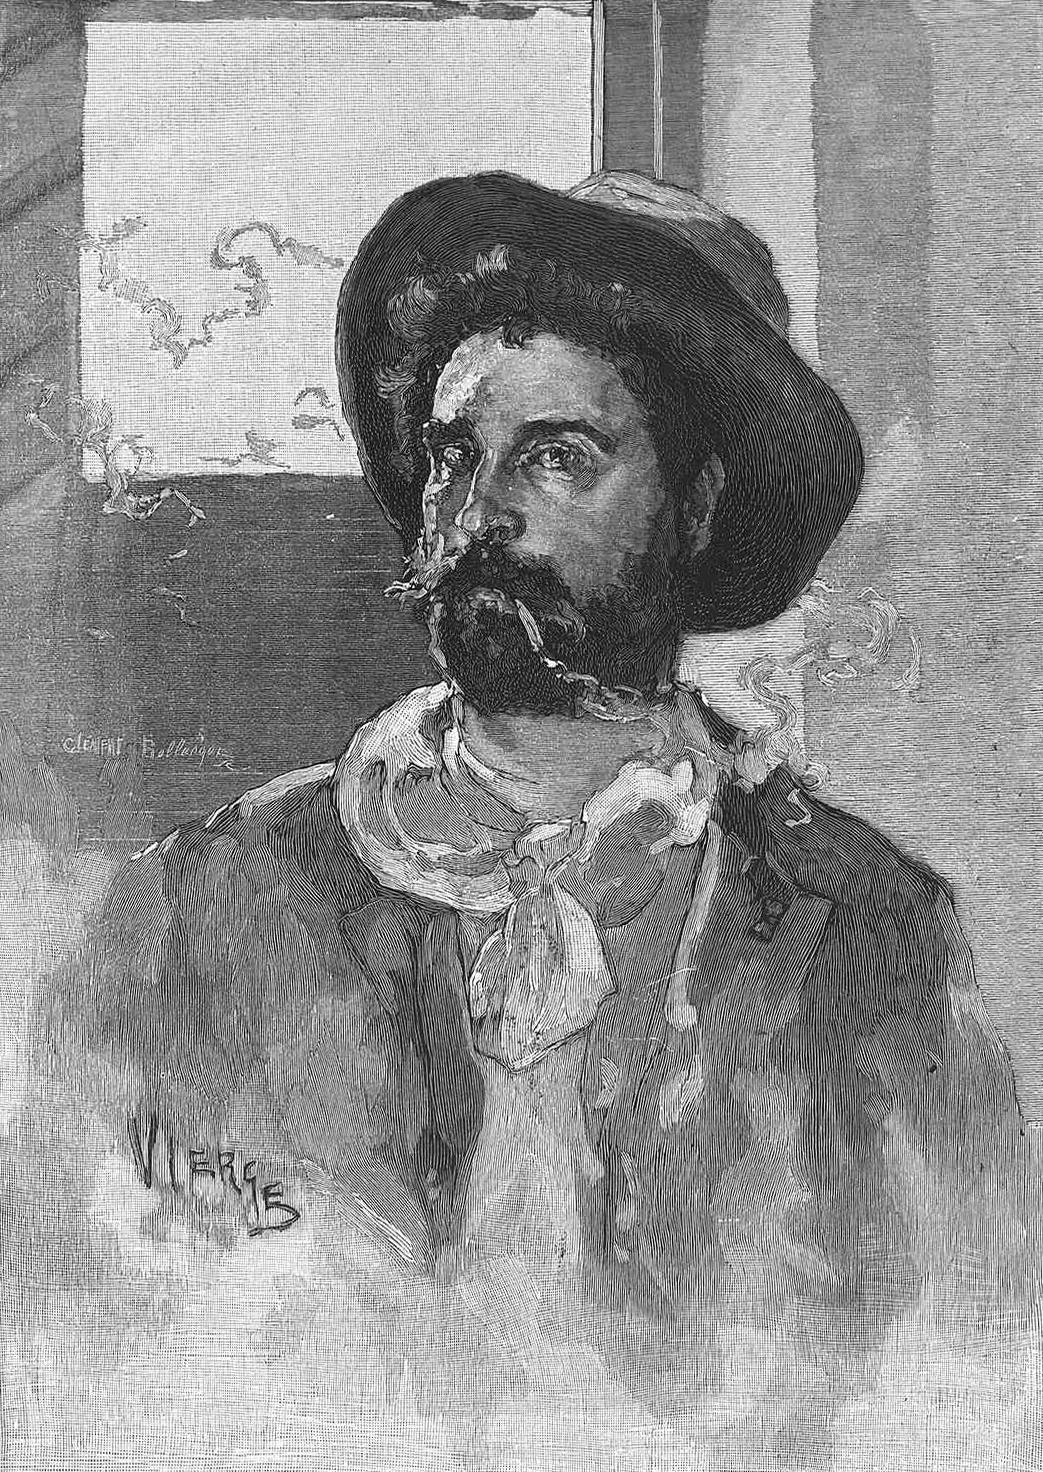 Daniel Urrabieta Vierge. Autorretrato